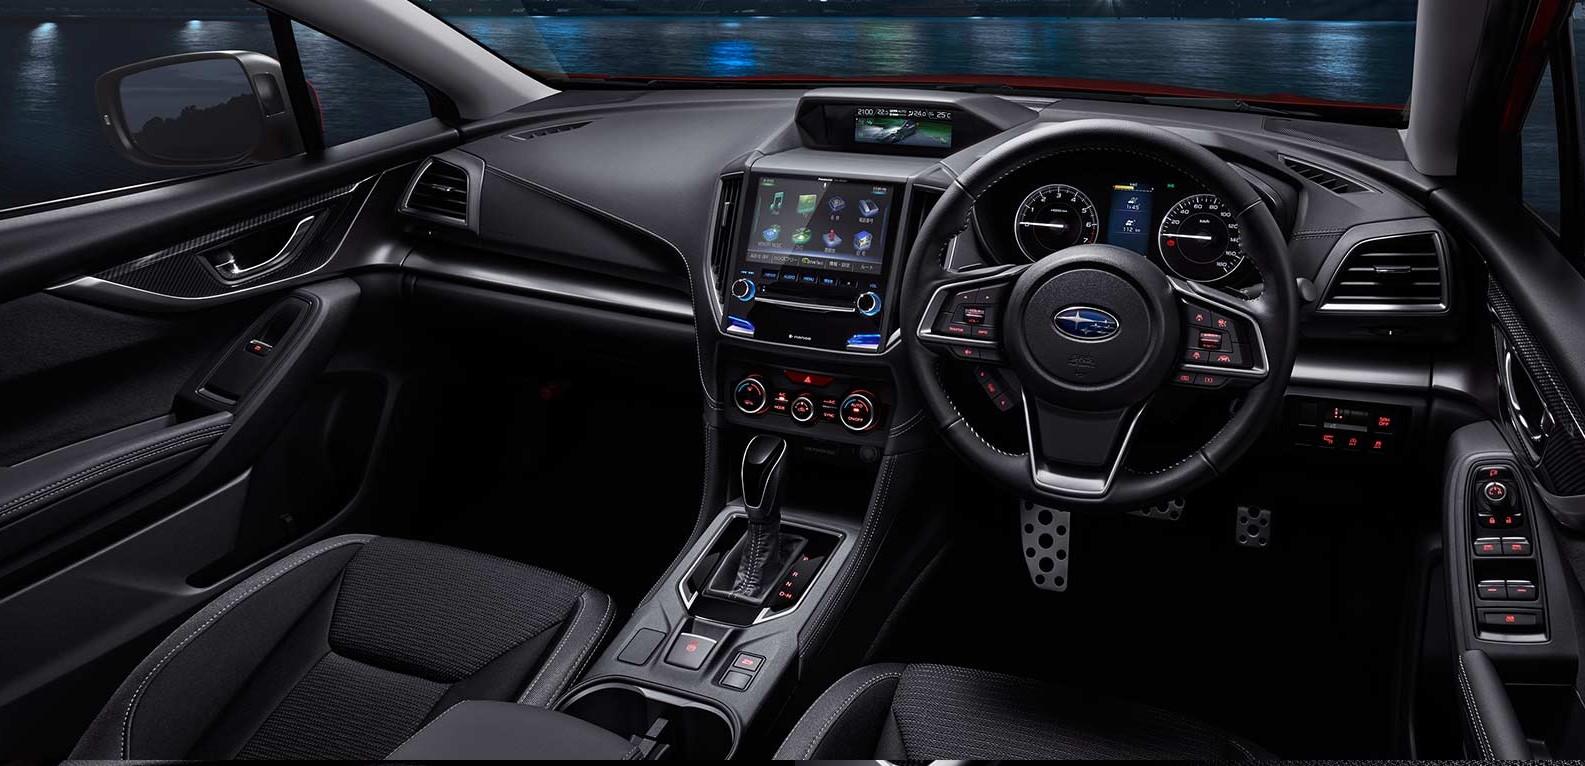 Leopaul 39 S Blog Fifth Generation Subaru Impreza Gk Gt